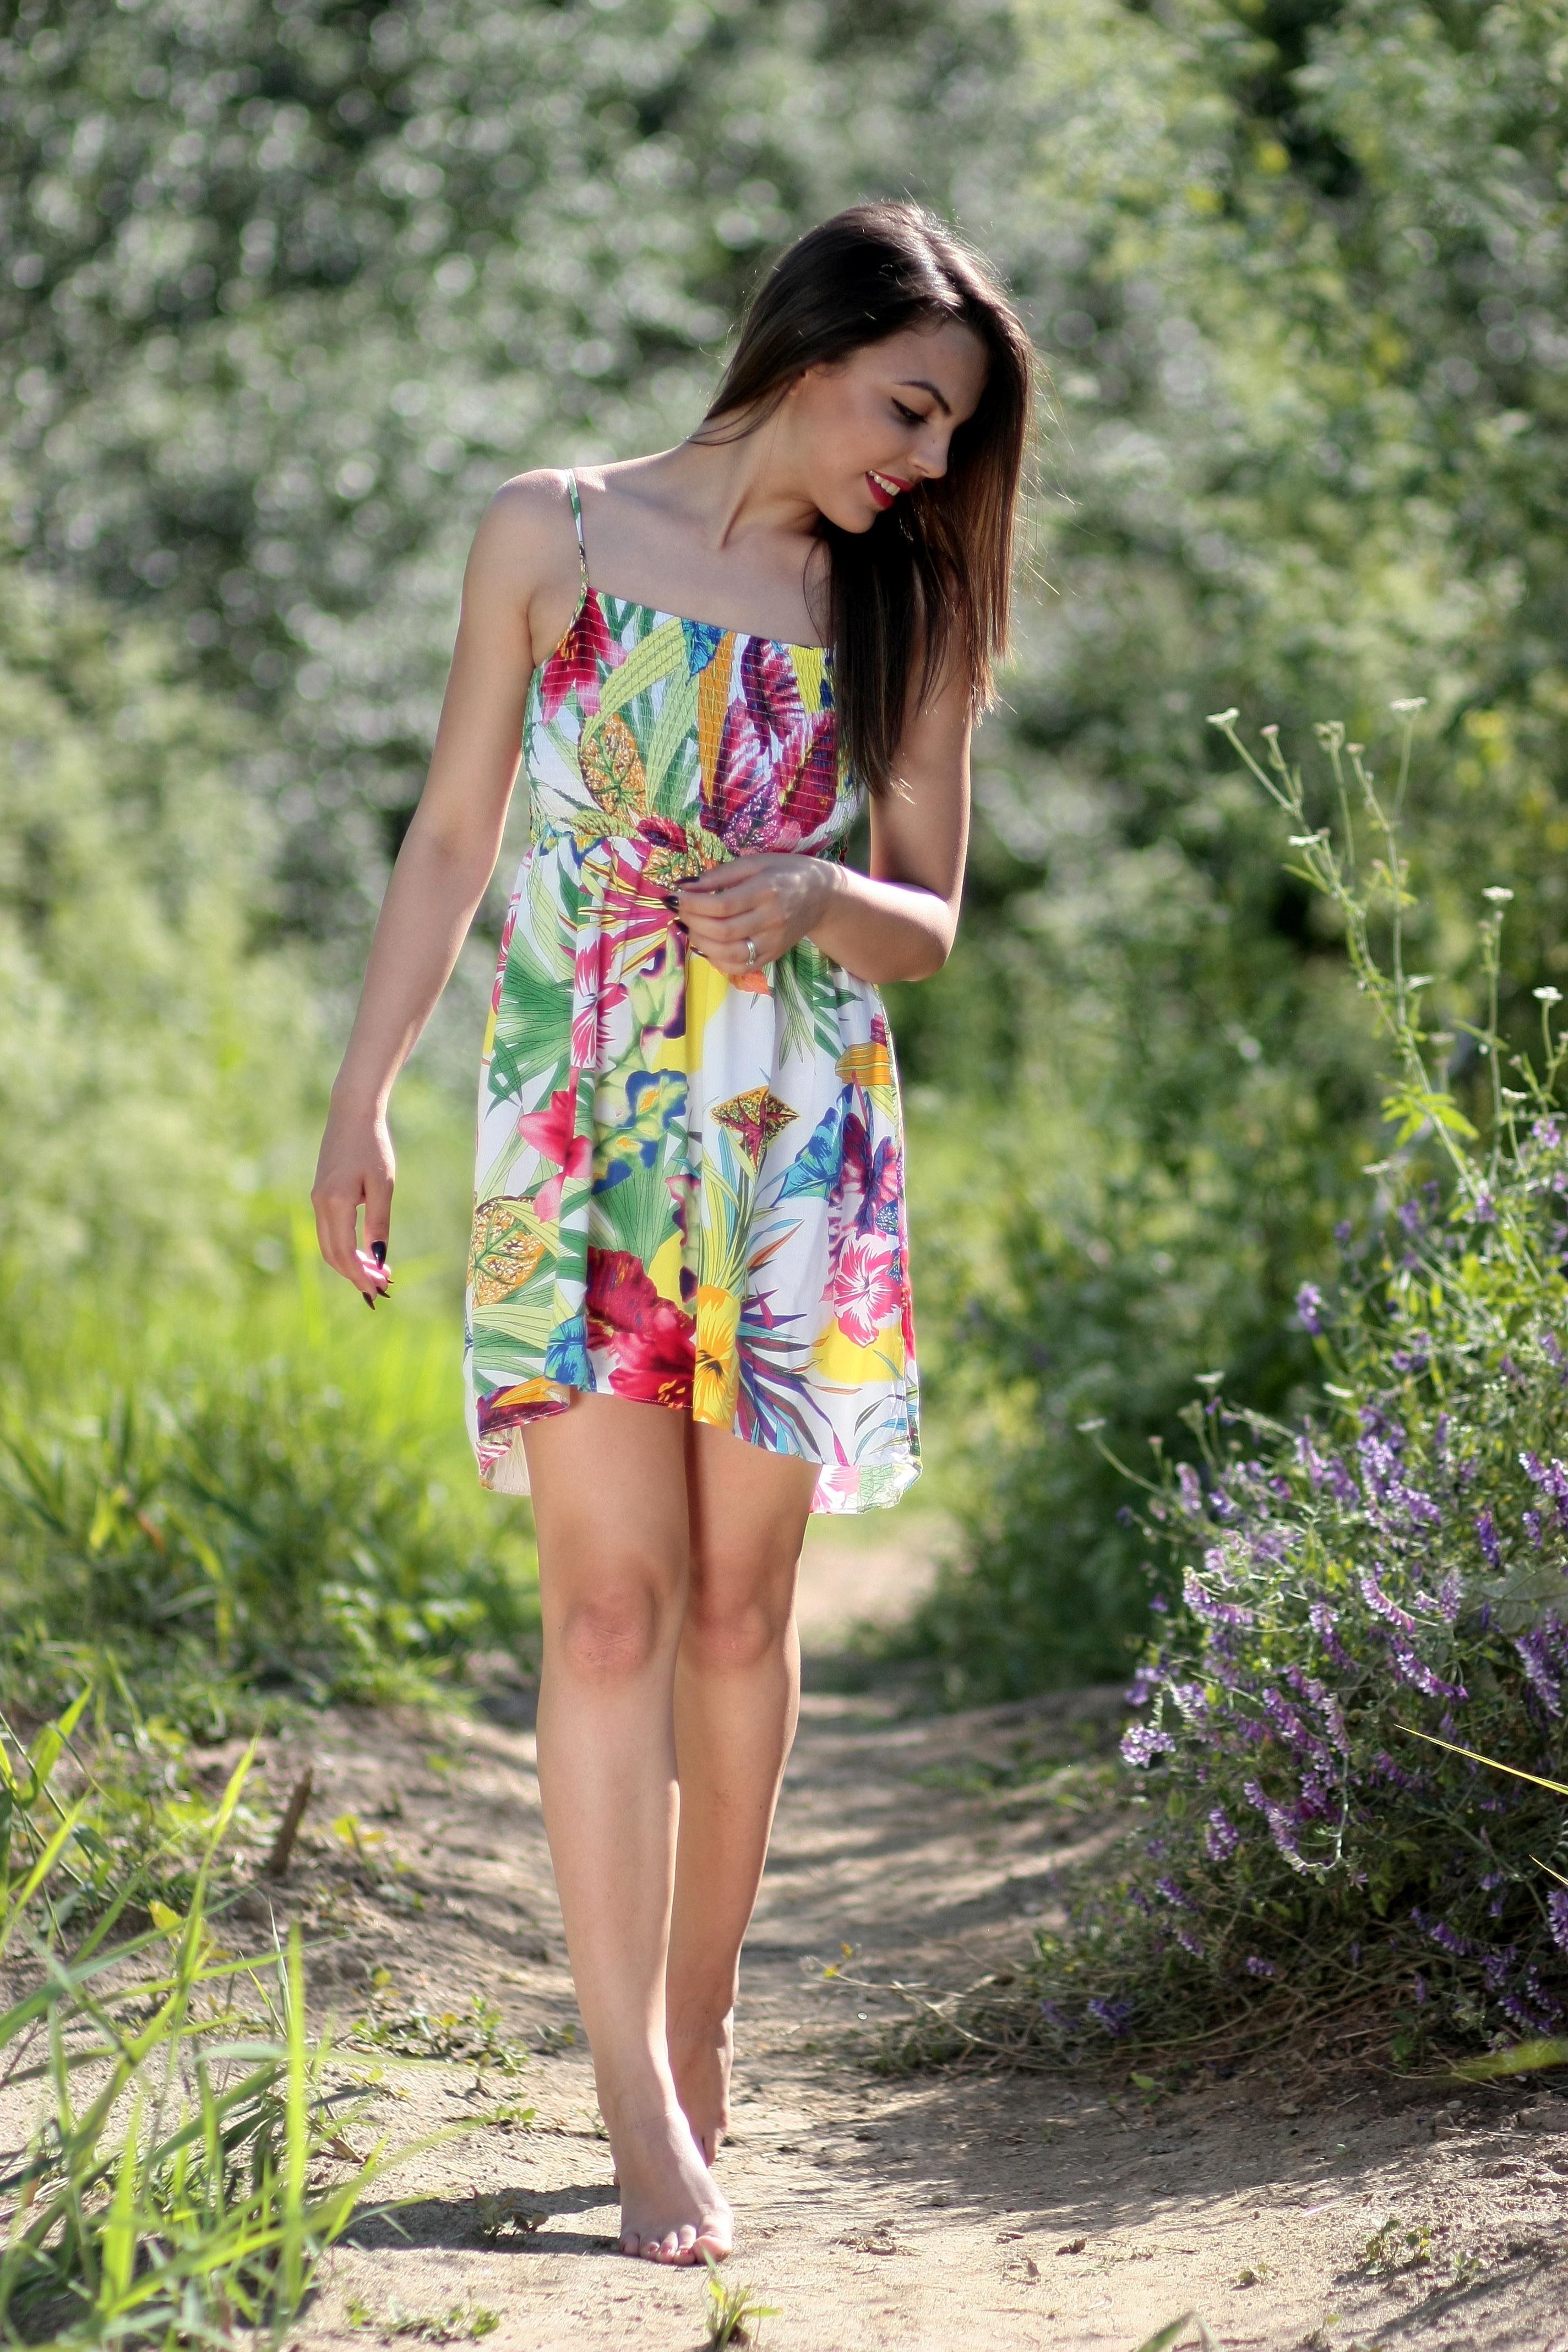 Free Images  Nature, Girl, Summer, Leg, Model, Spring -4061